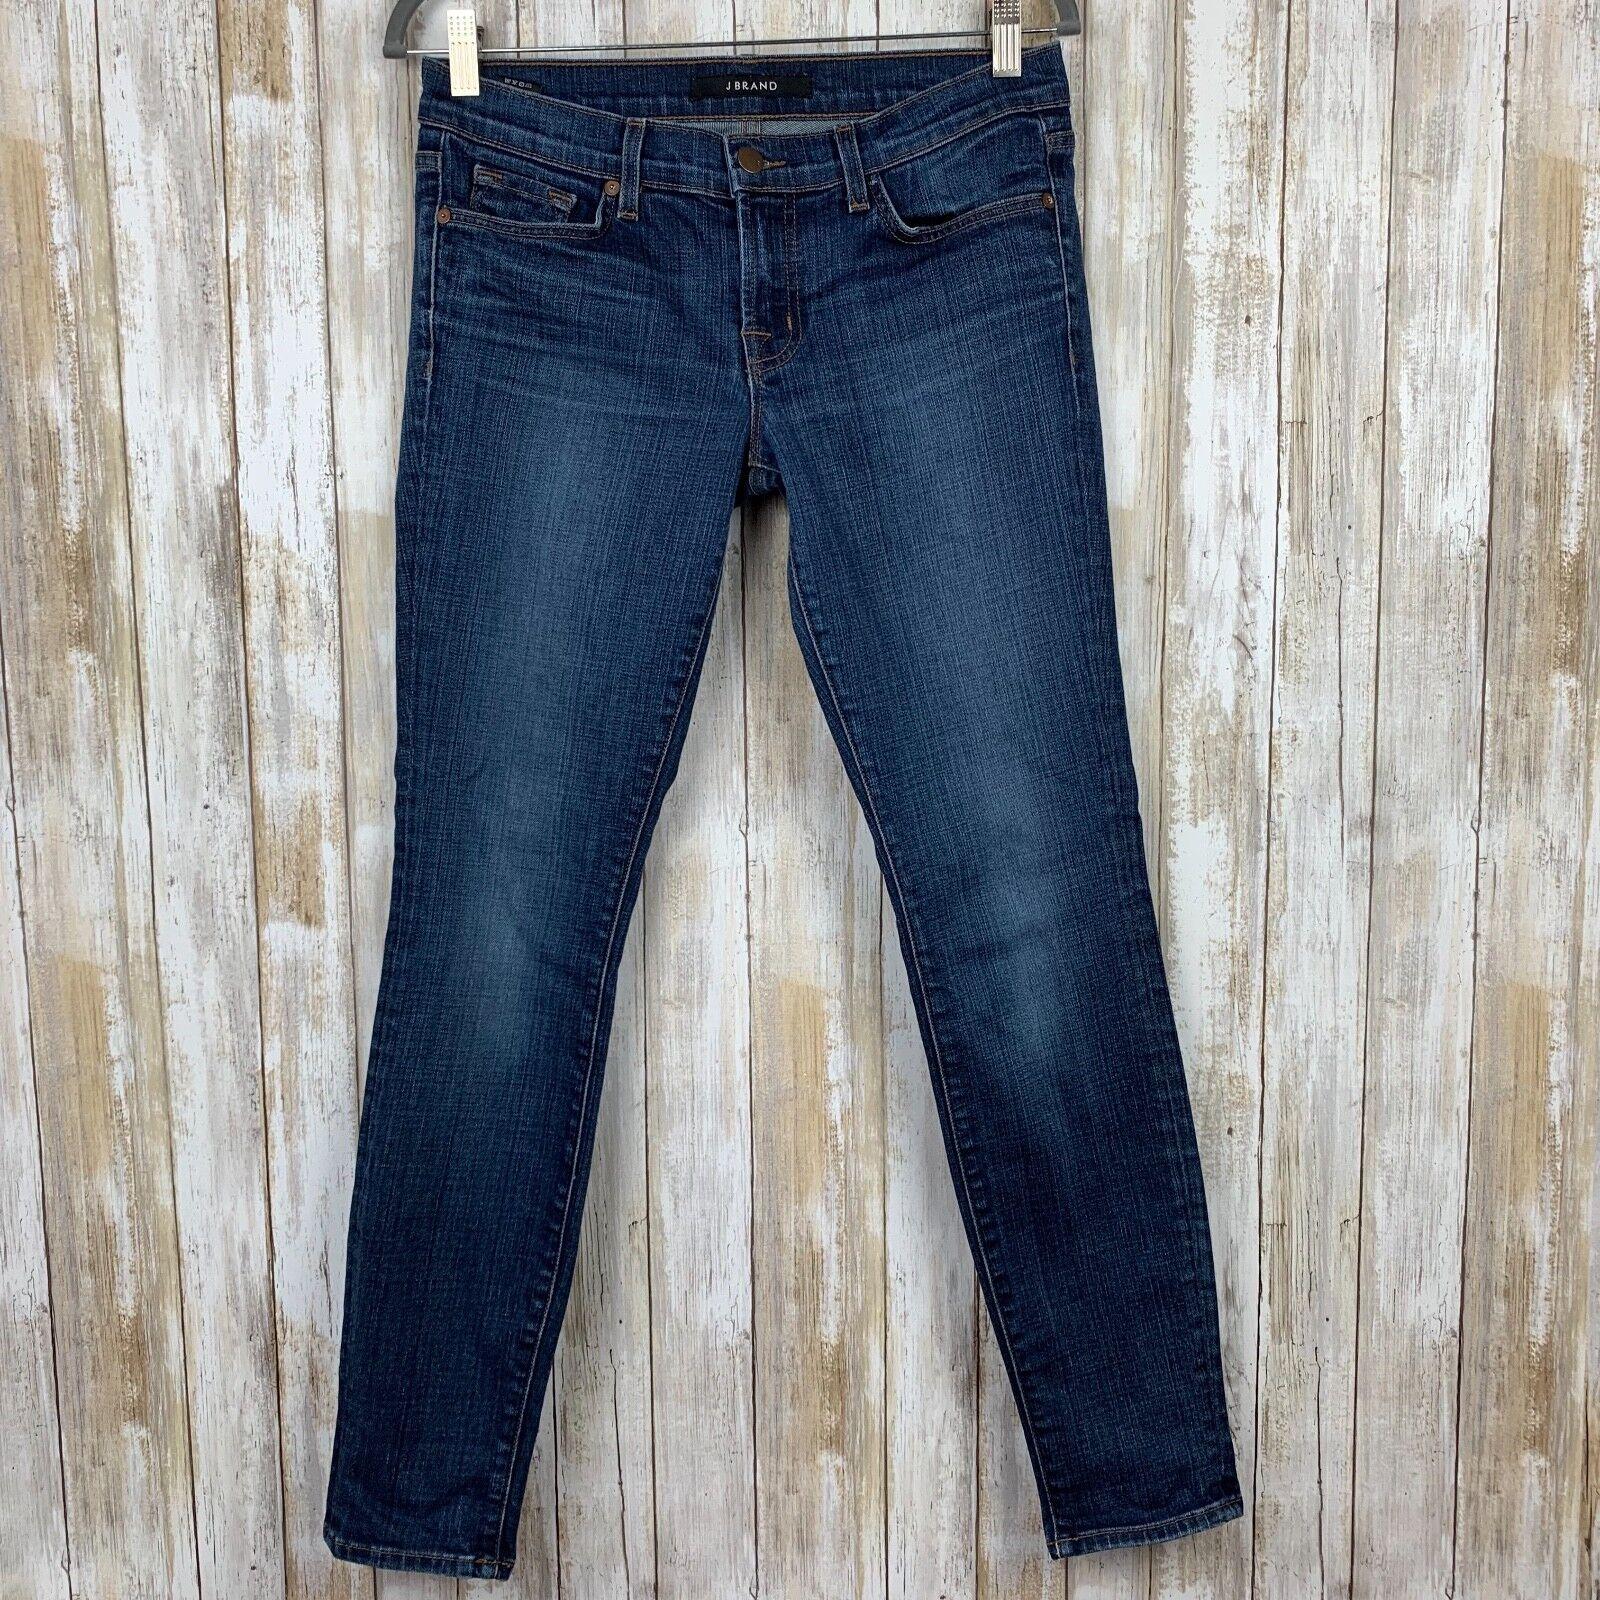 J BRAND Skinny Leg Stretch Jeans League Dark bluee Wash 27 Classic Fit